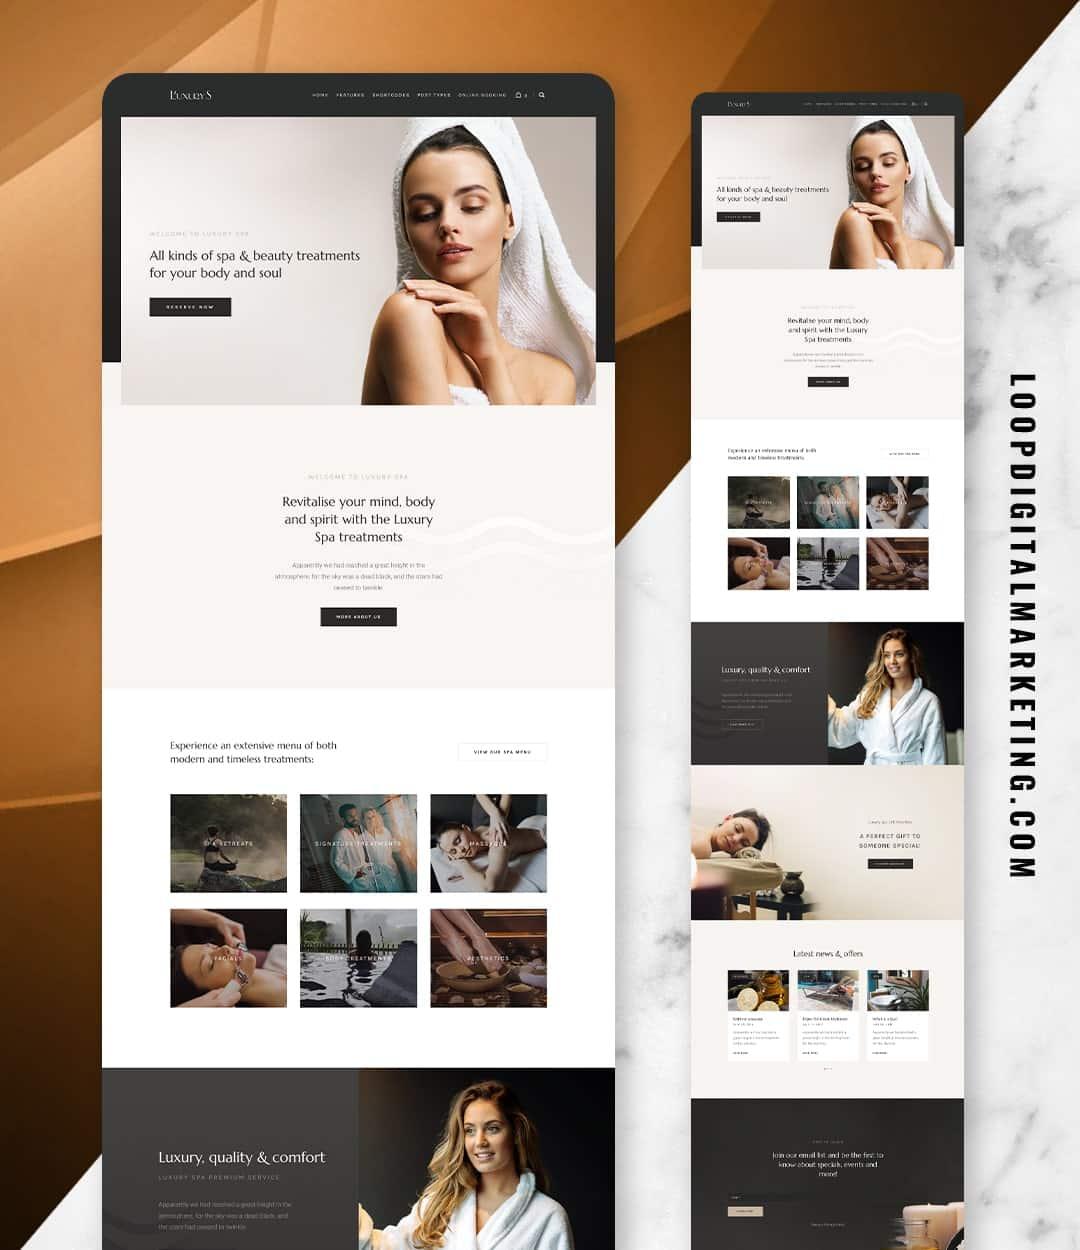 BEAUTY/SPA WEBSITE DESIGN